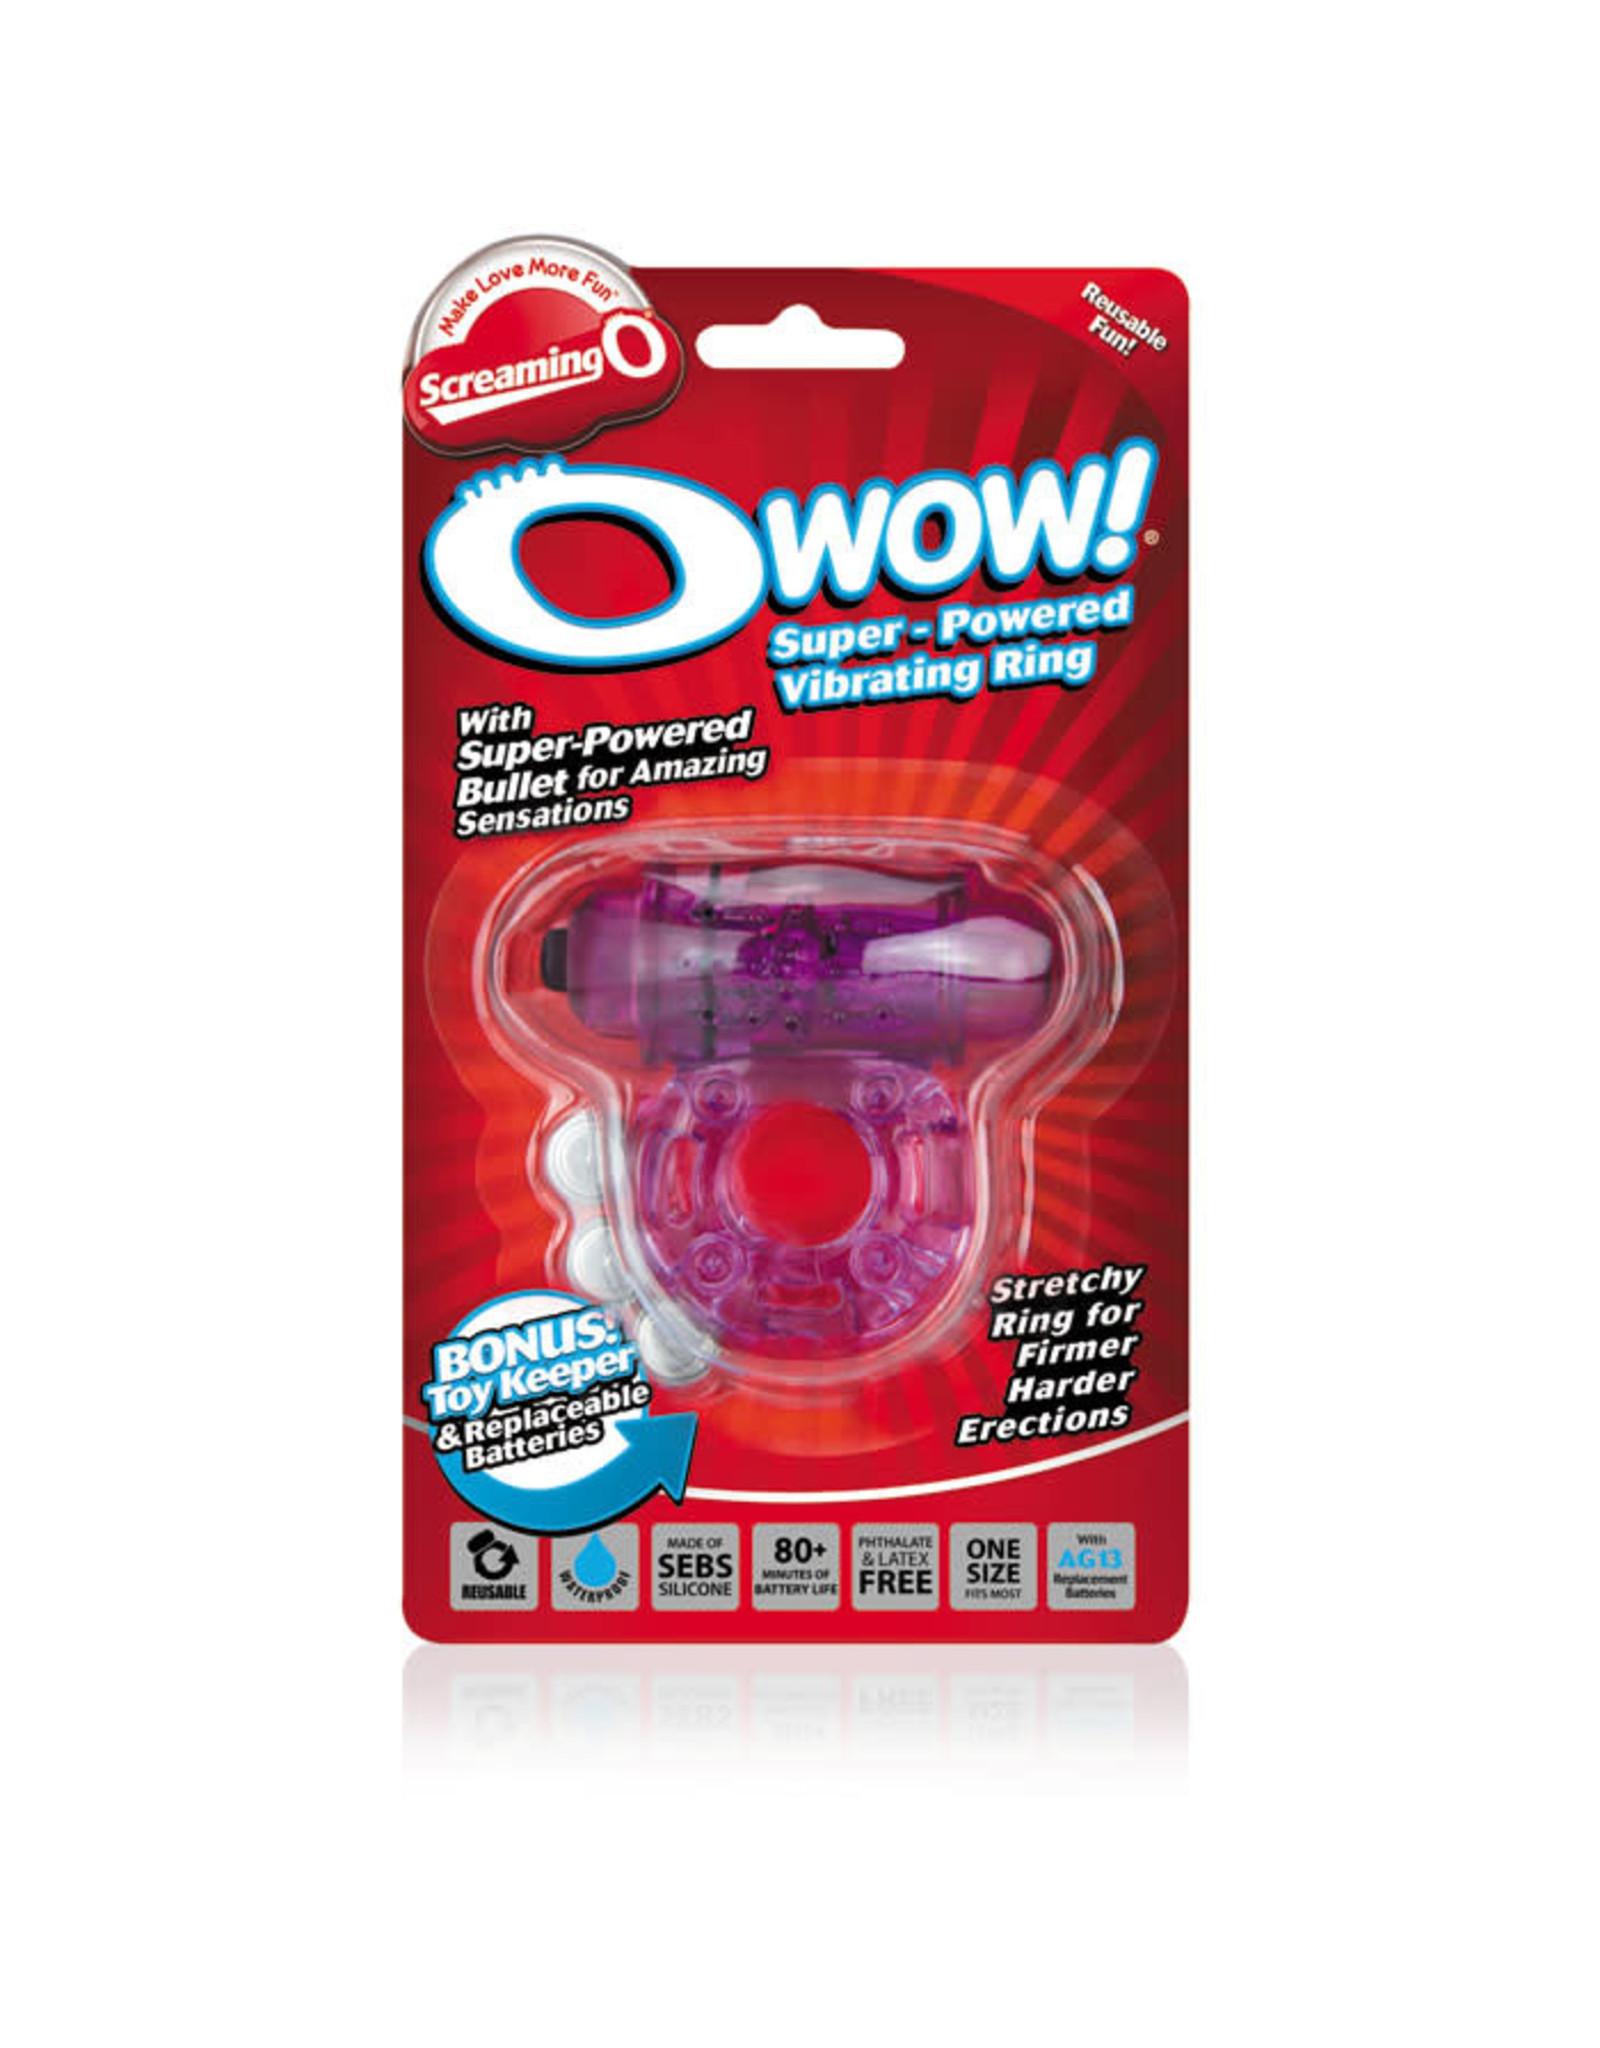 Screaming O O Wow Super Powered Vibrating Ring